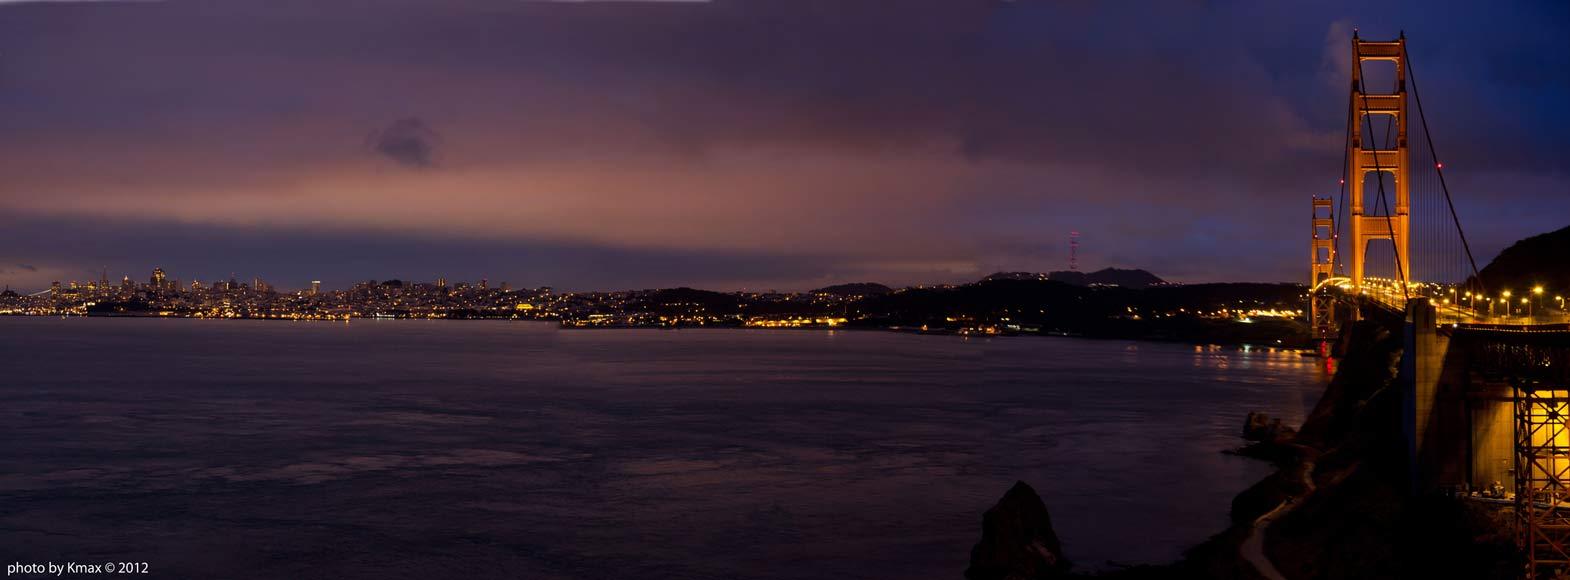 Golden Gate Bridge original photo by Kmax